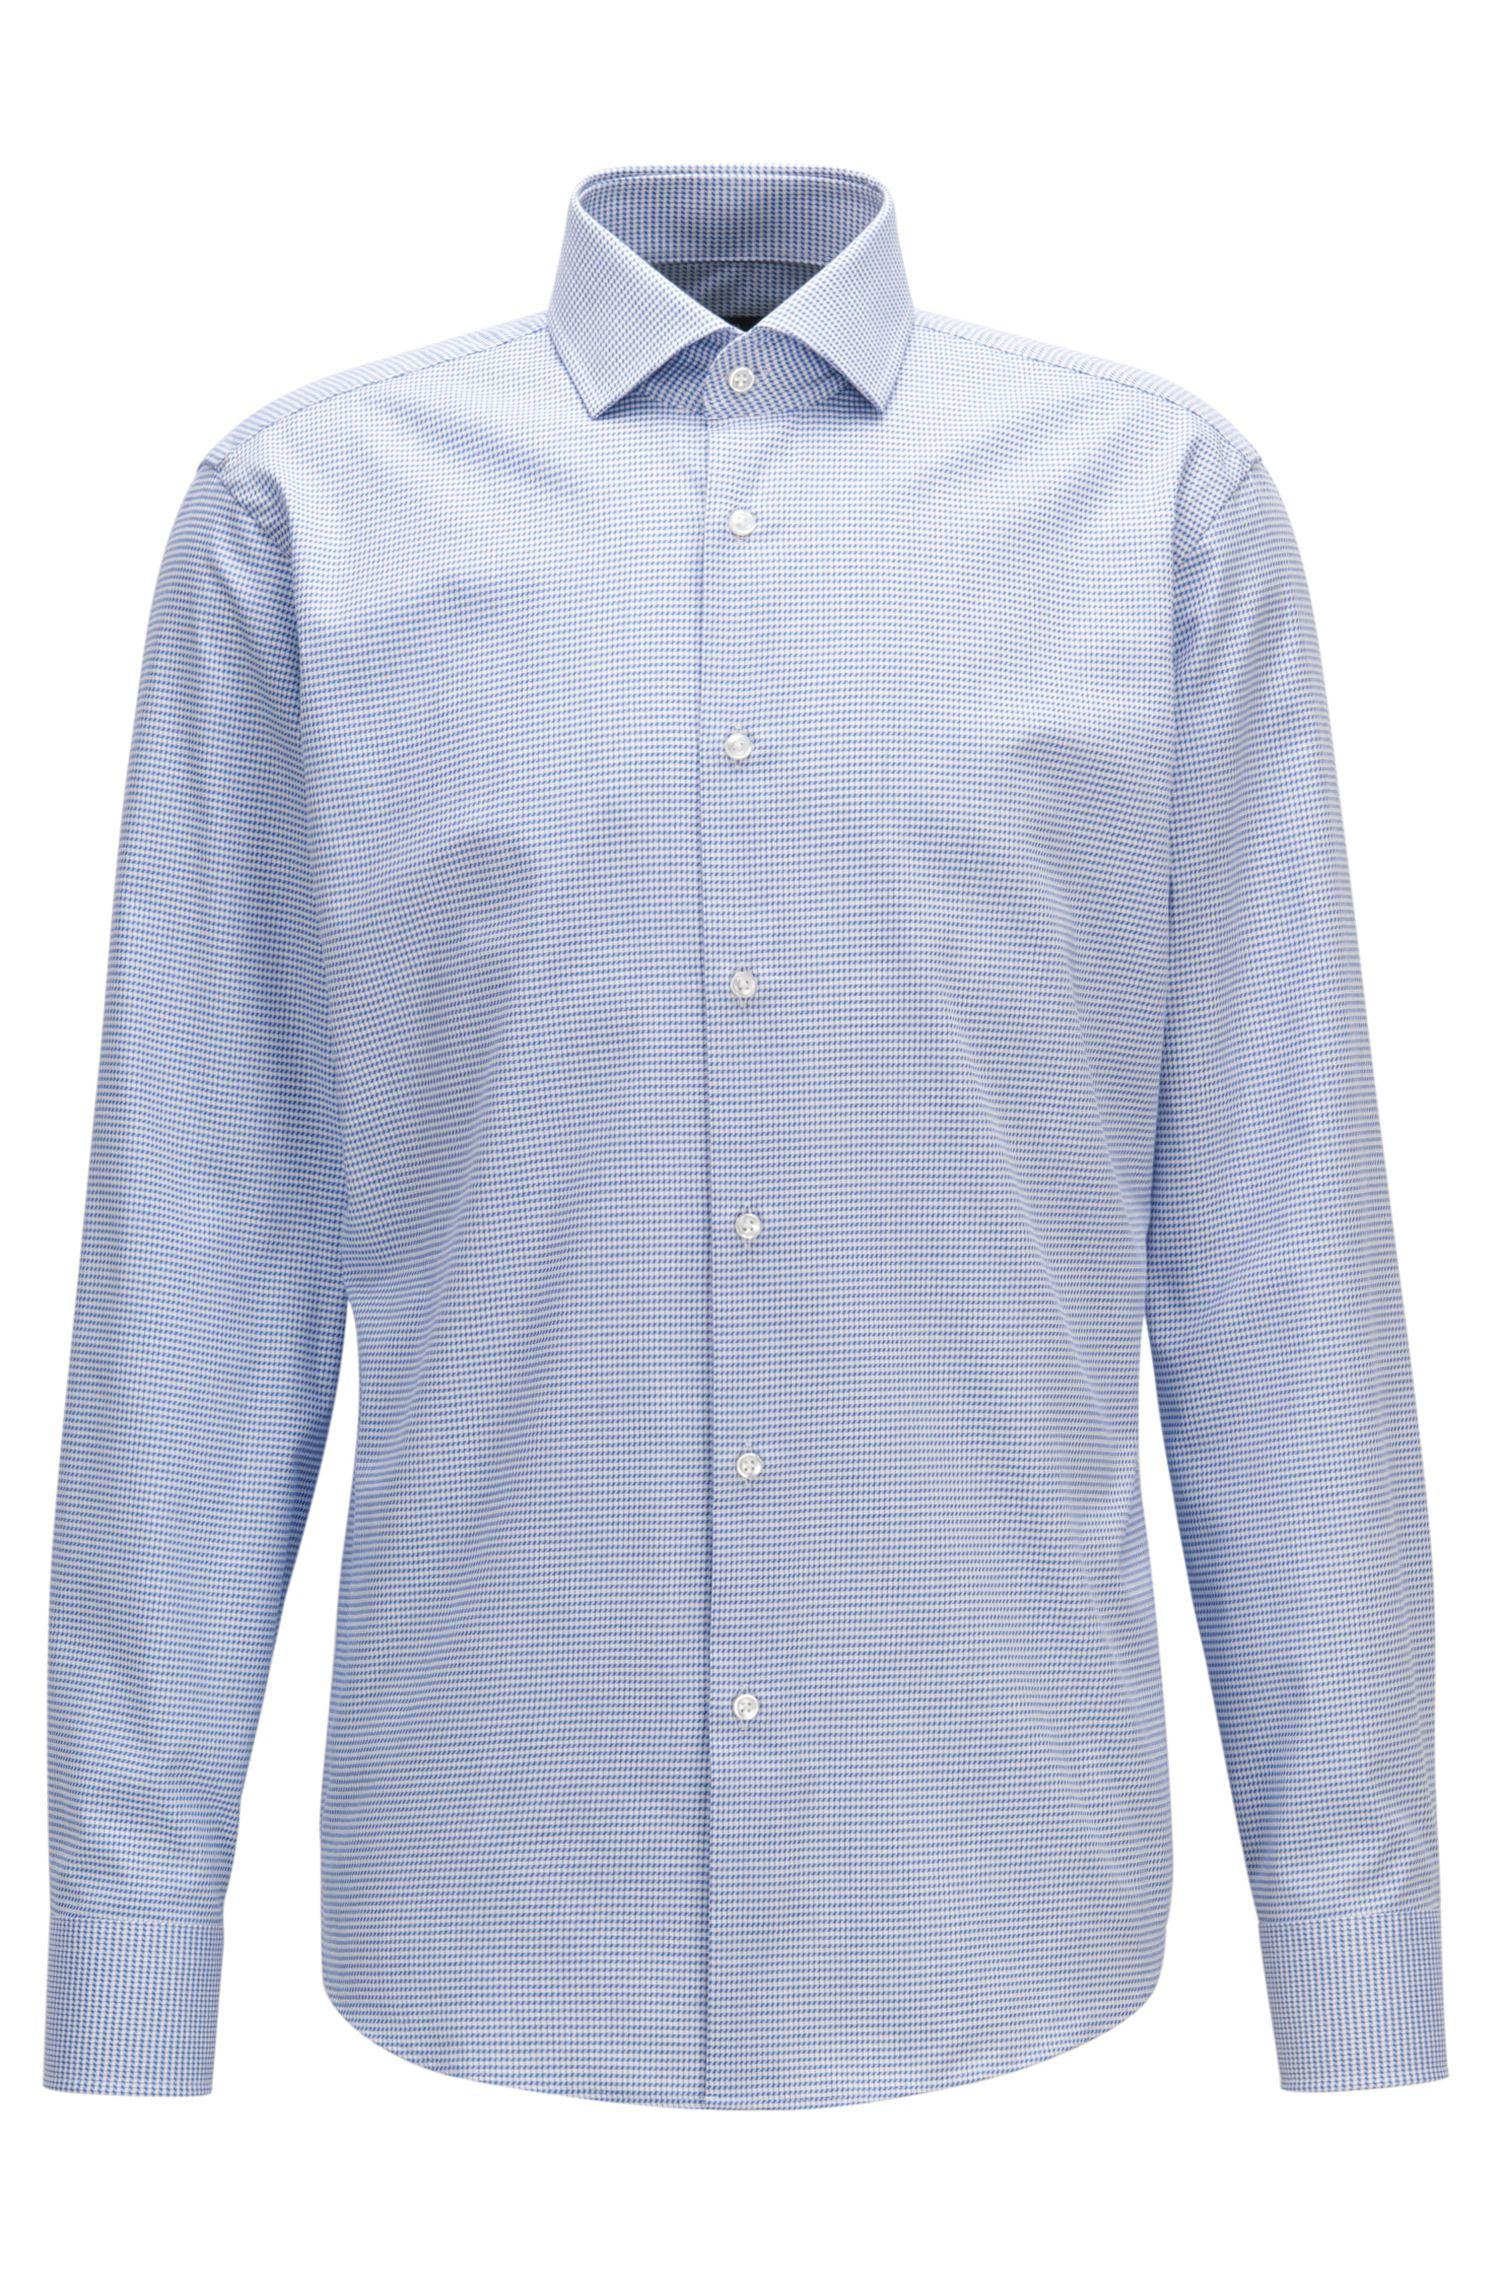 Geometric Check Cotton Dress Shirt, Regular Fit | Gordon